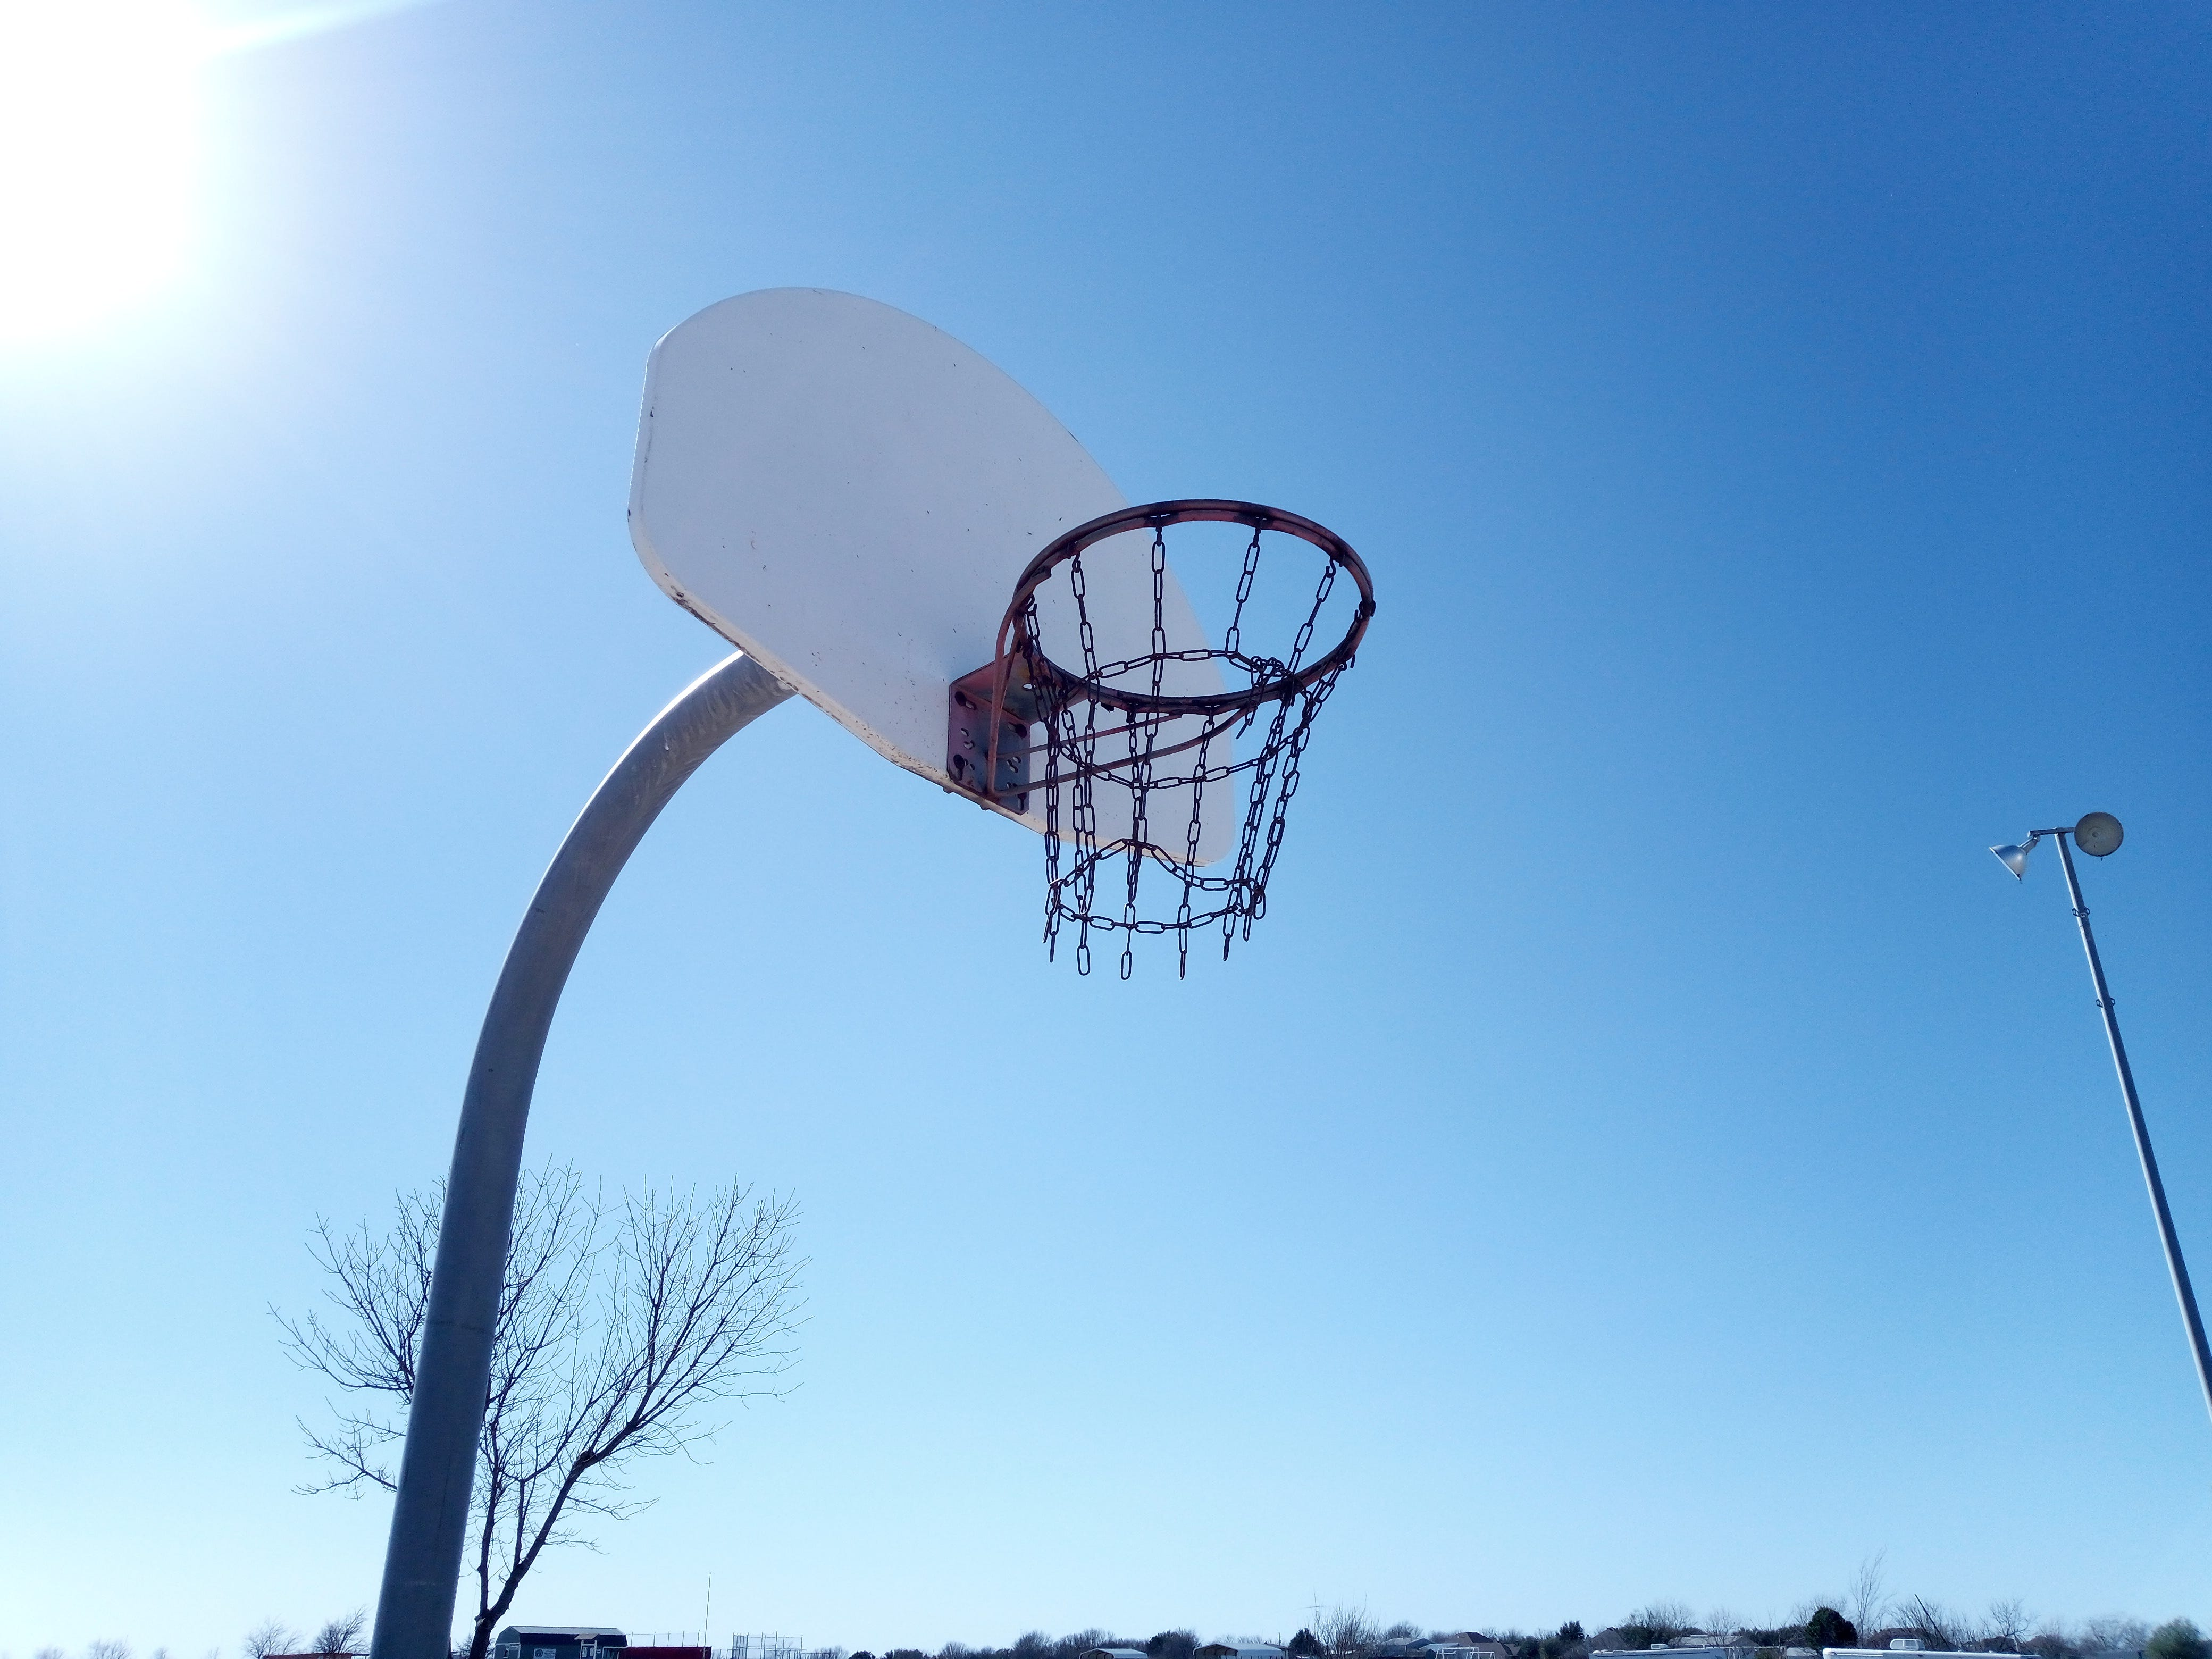 Cat S42 sample photo: basketball hoop